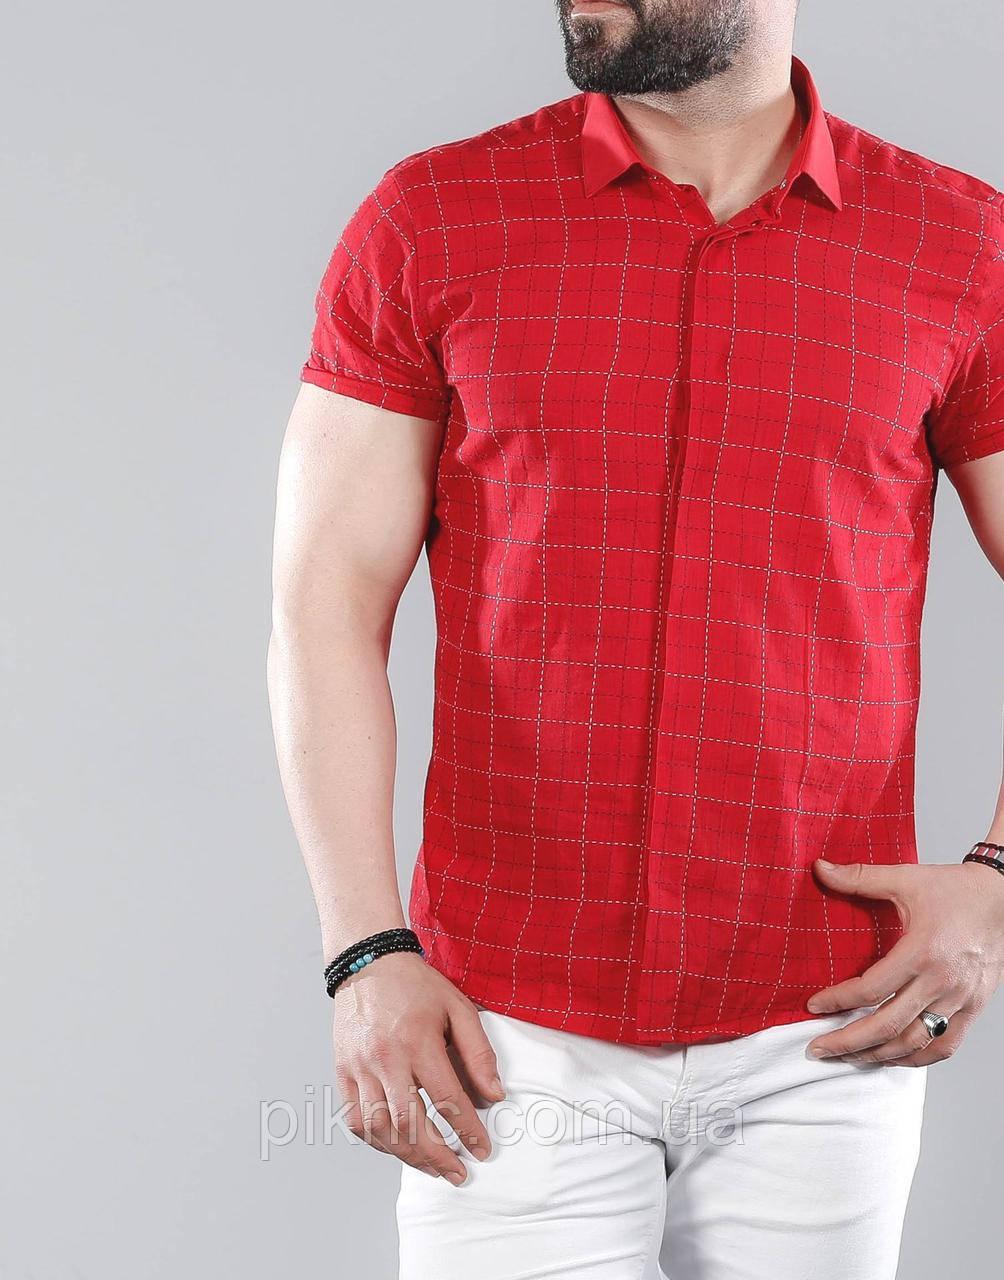 Рубашка мужская приталенная, короткий рукав. Льняная турецкая рубашка с коротким рукавом. Красная